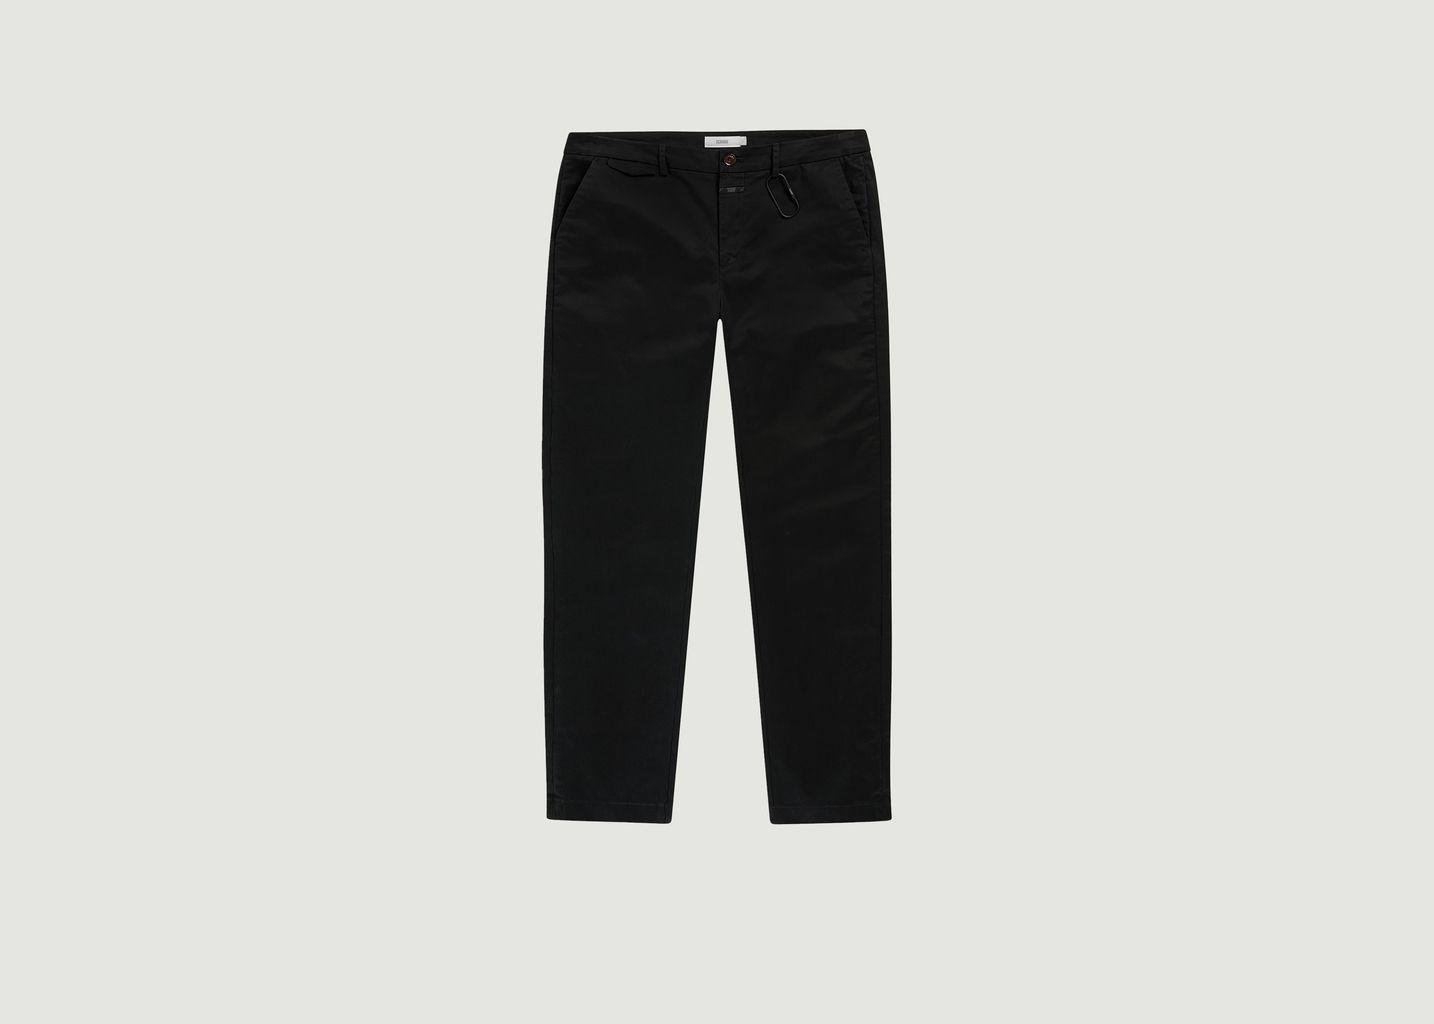 Pantalon Atelier Tapered  - Closed